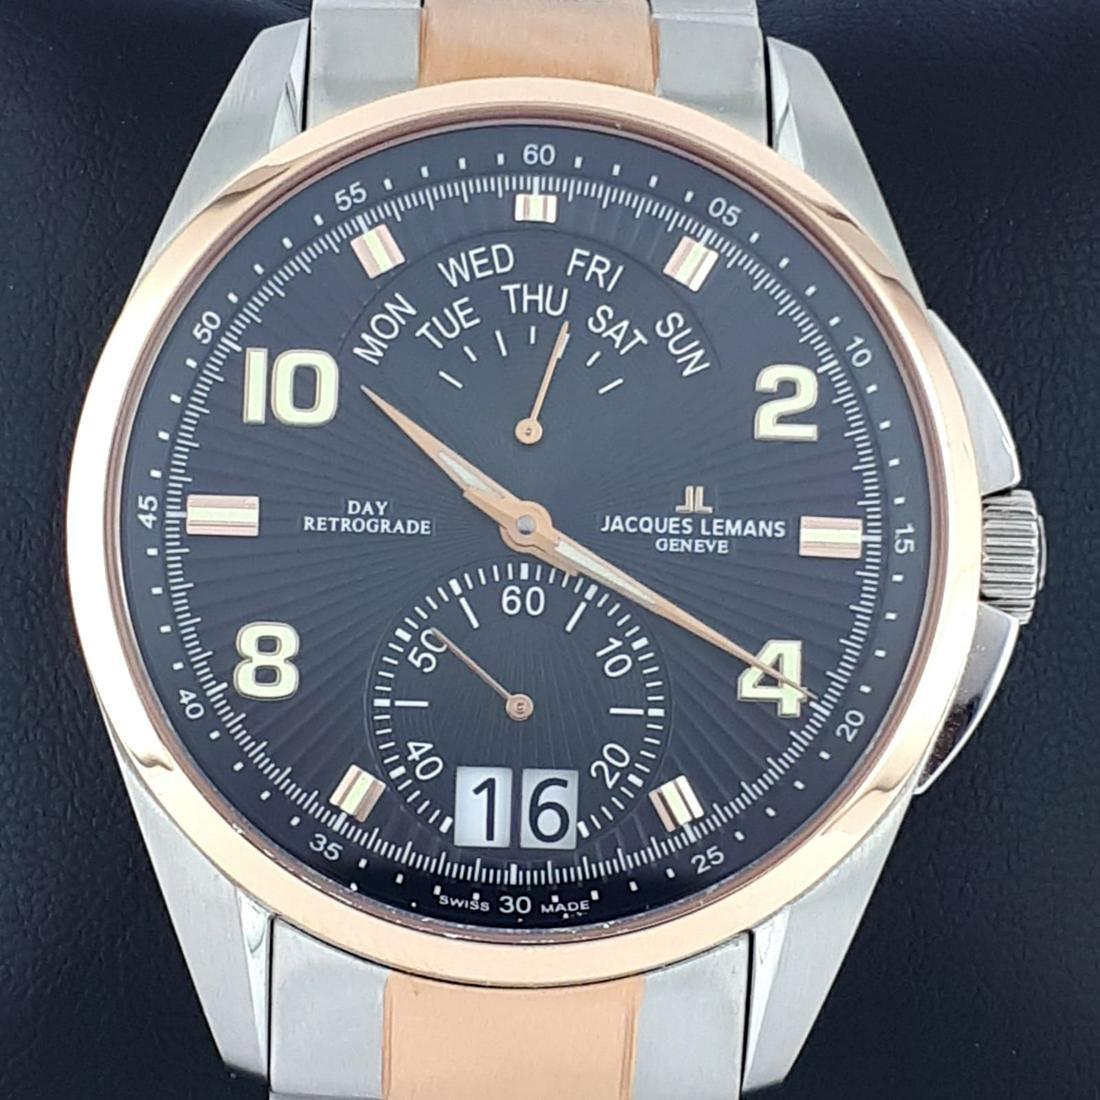 Jaques Lemans - Diver Chronographe ( Swiss Made) - ref: